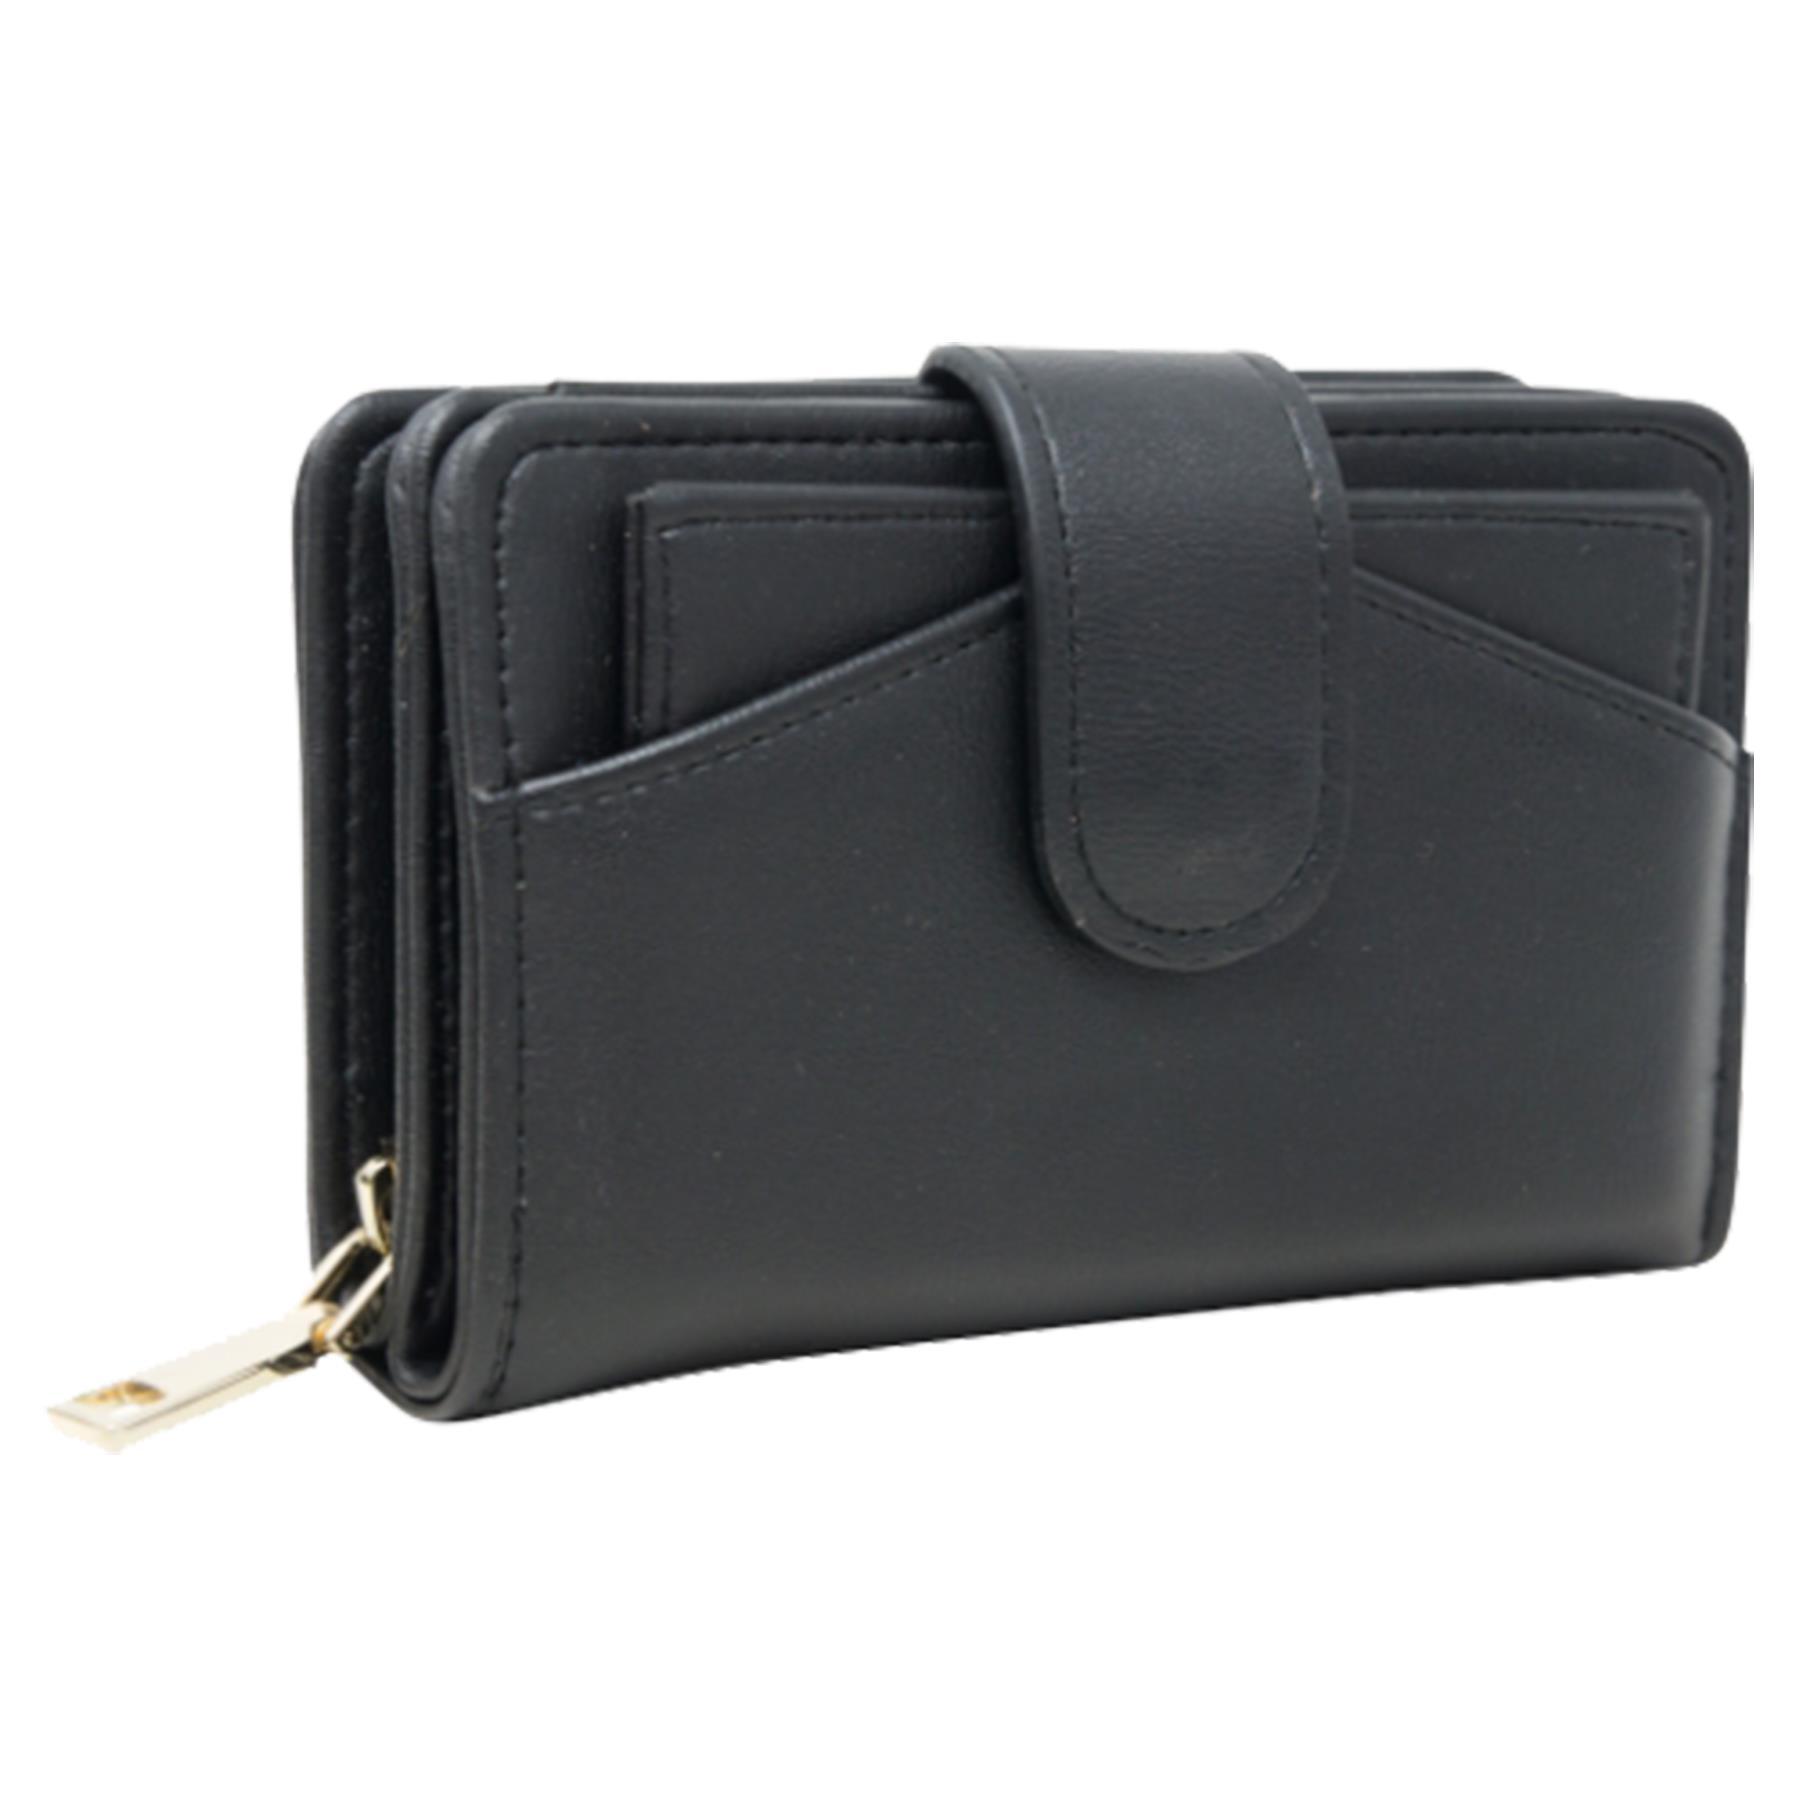 New-Ladies-Card-Slots-Zipped-Pocket-Faux-Leather-Basic-Wallet-Purse thumbnail 3